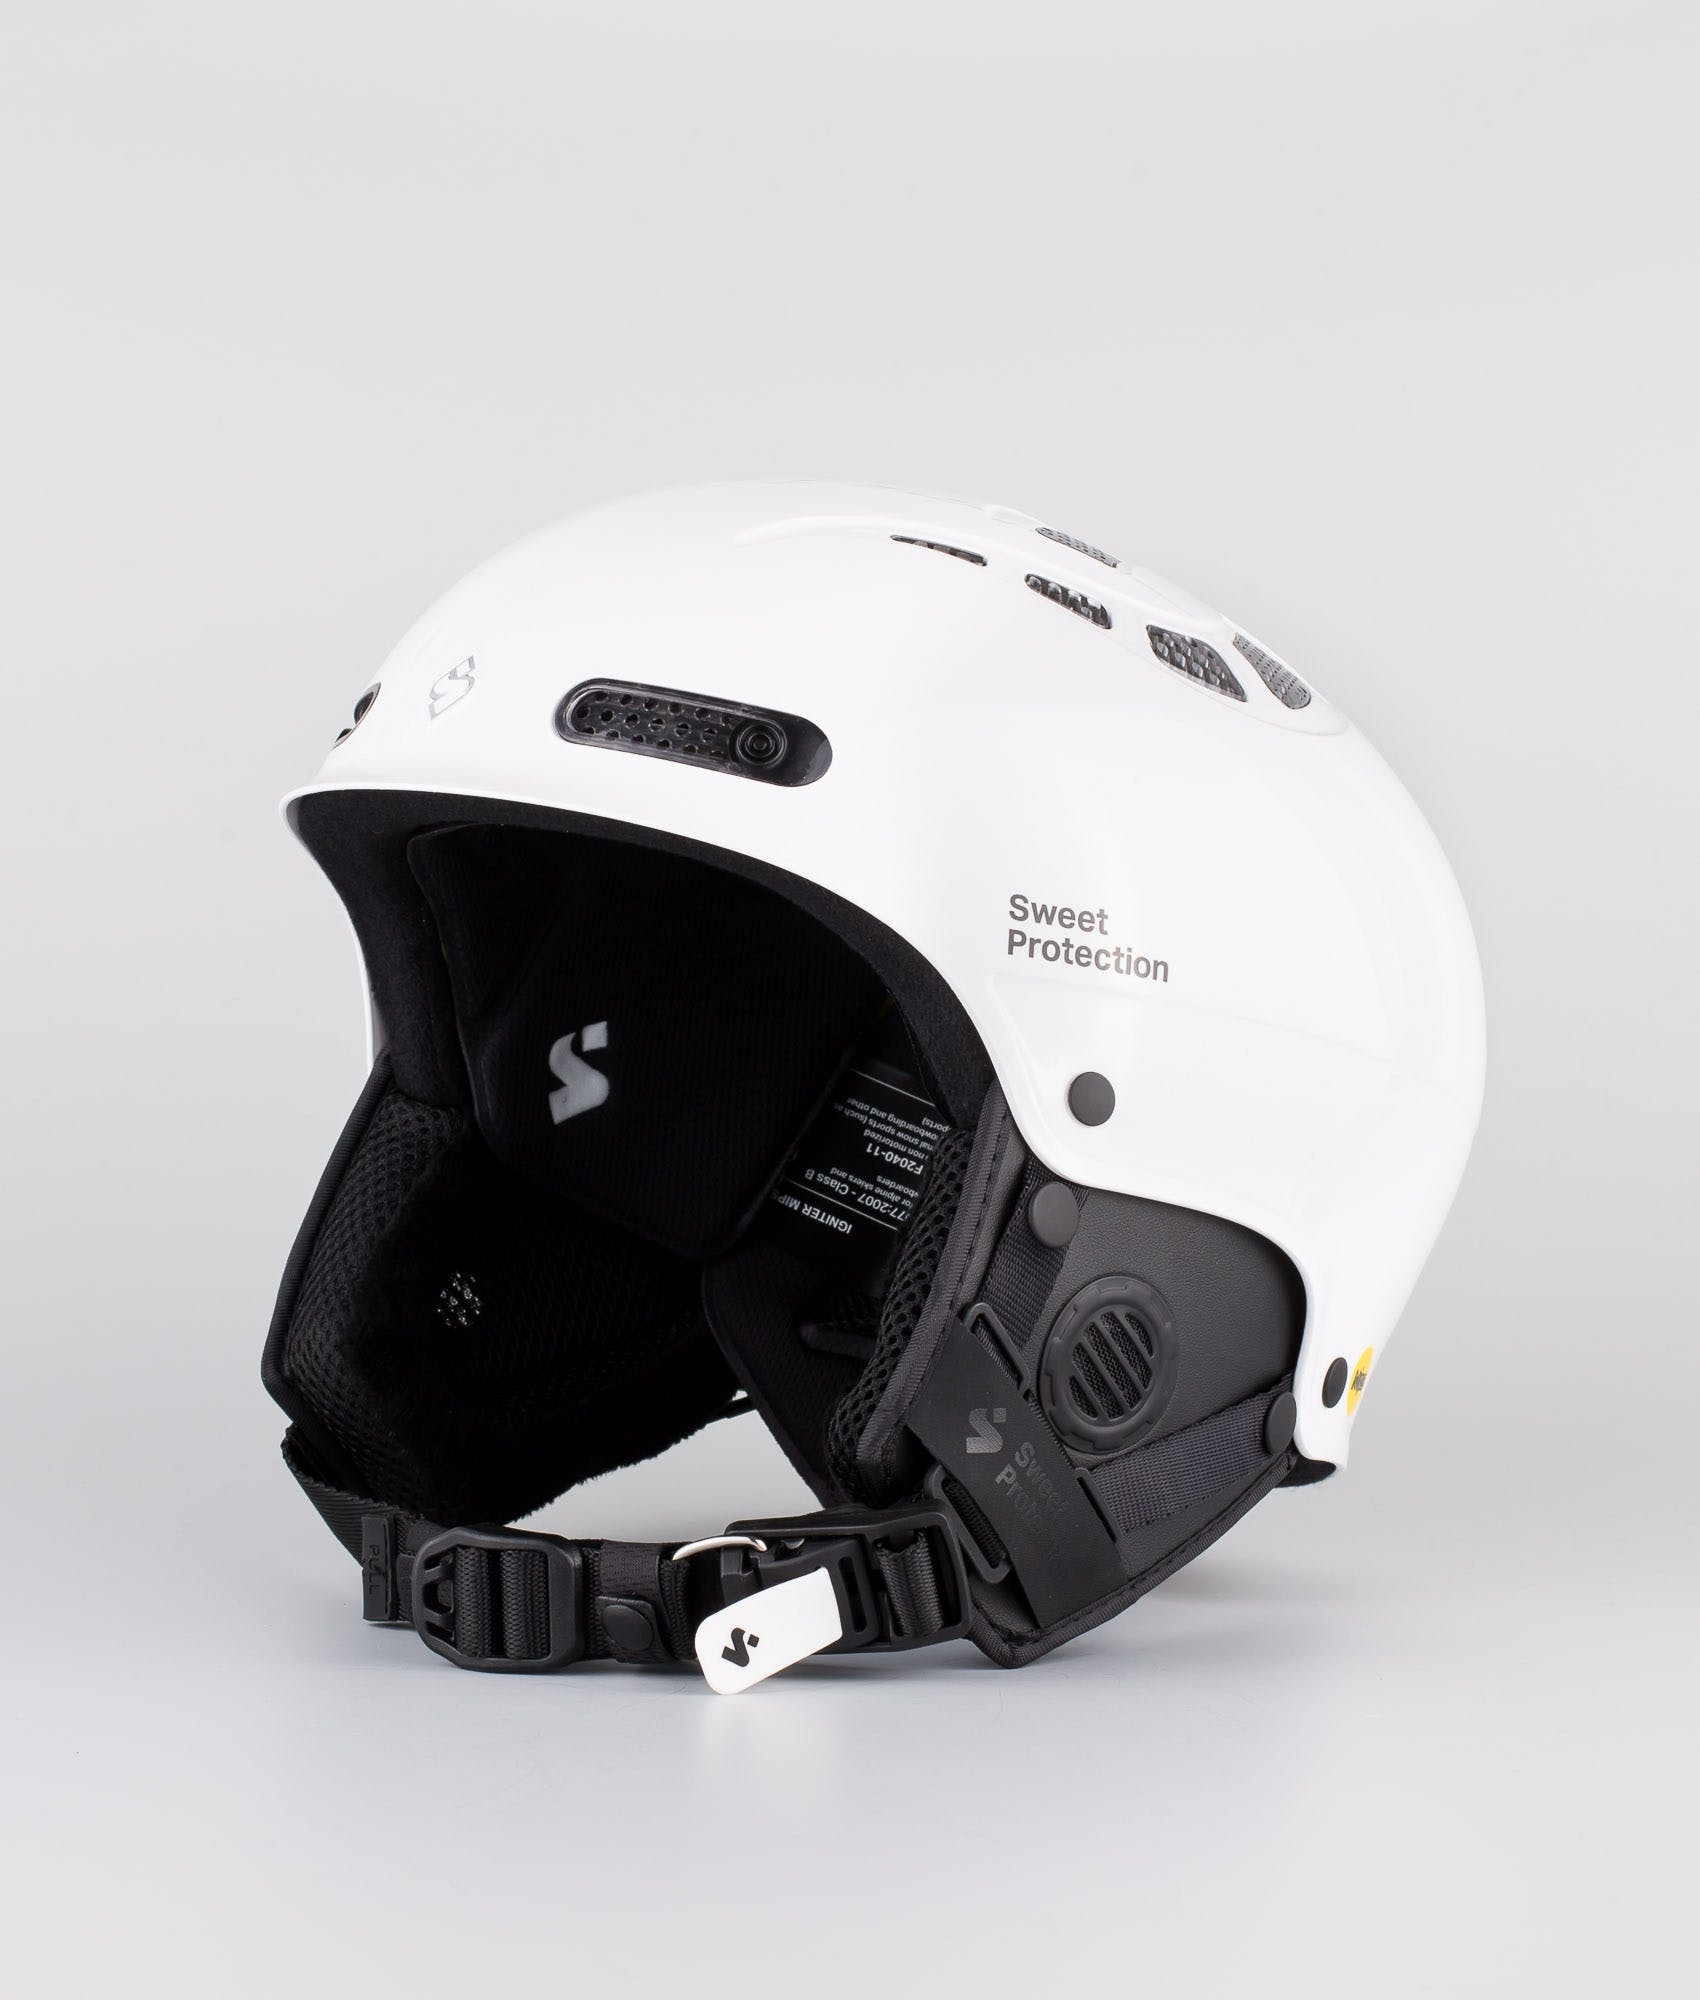 Sweet protection ski helmet